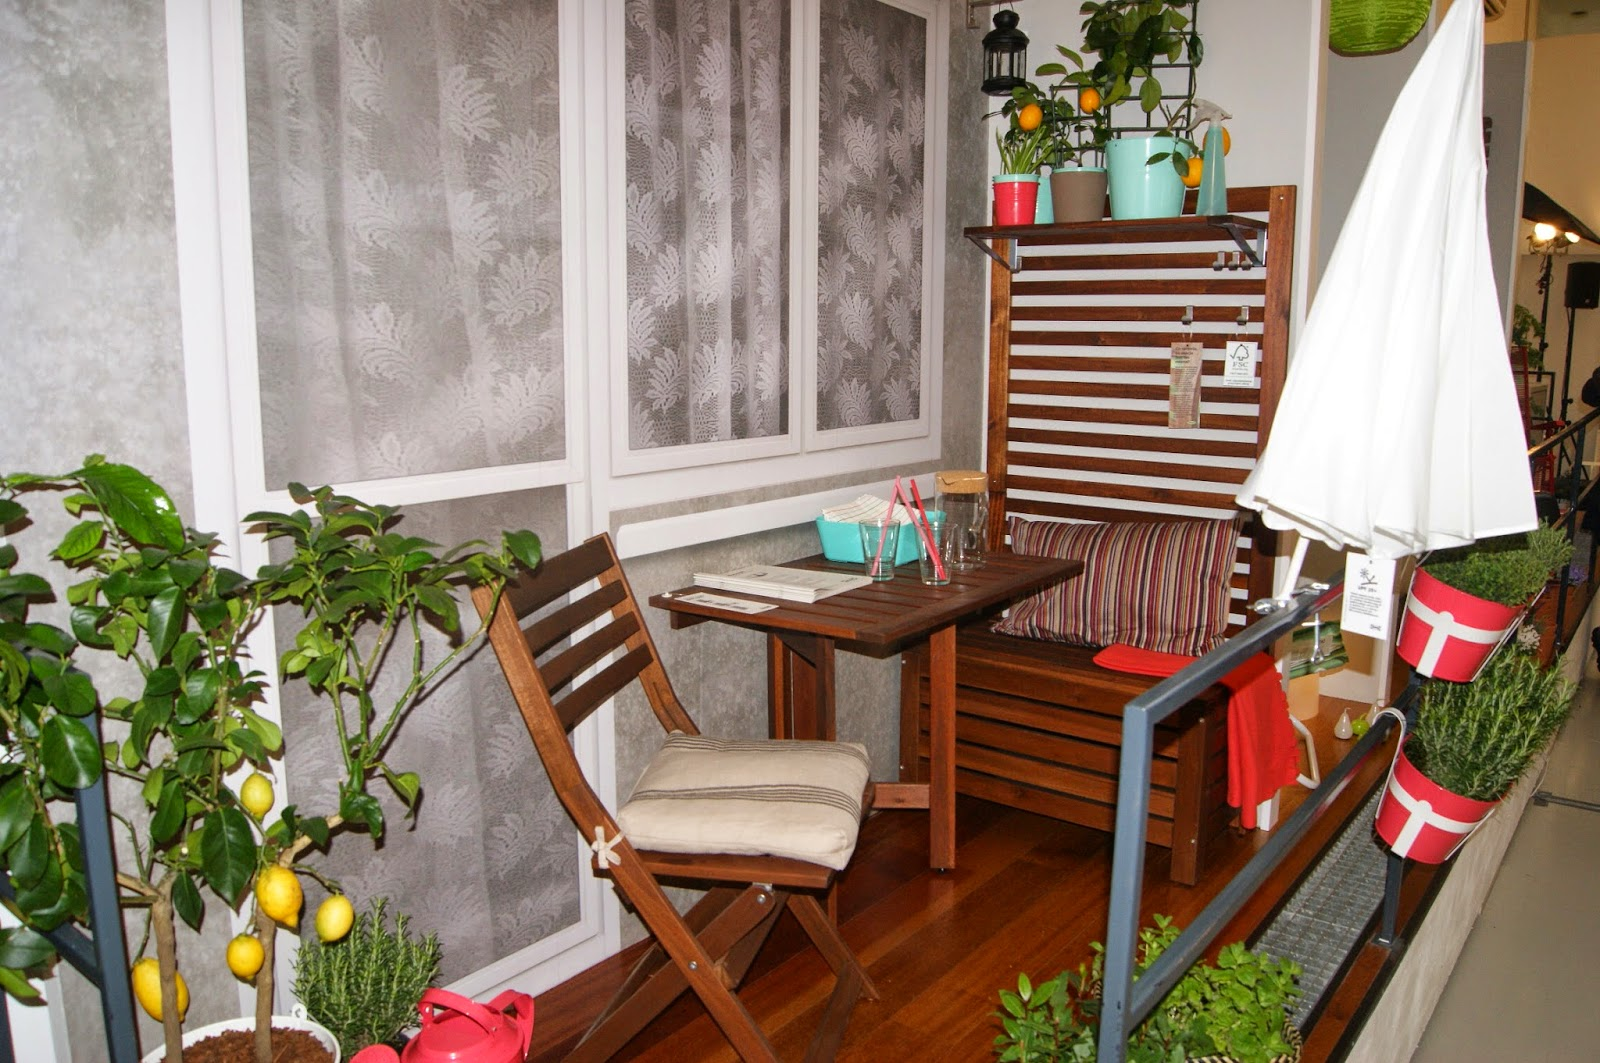 yj c z pasj weekend z ikea family. Black Bedroom Furniture Sets. Home Design Ideas